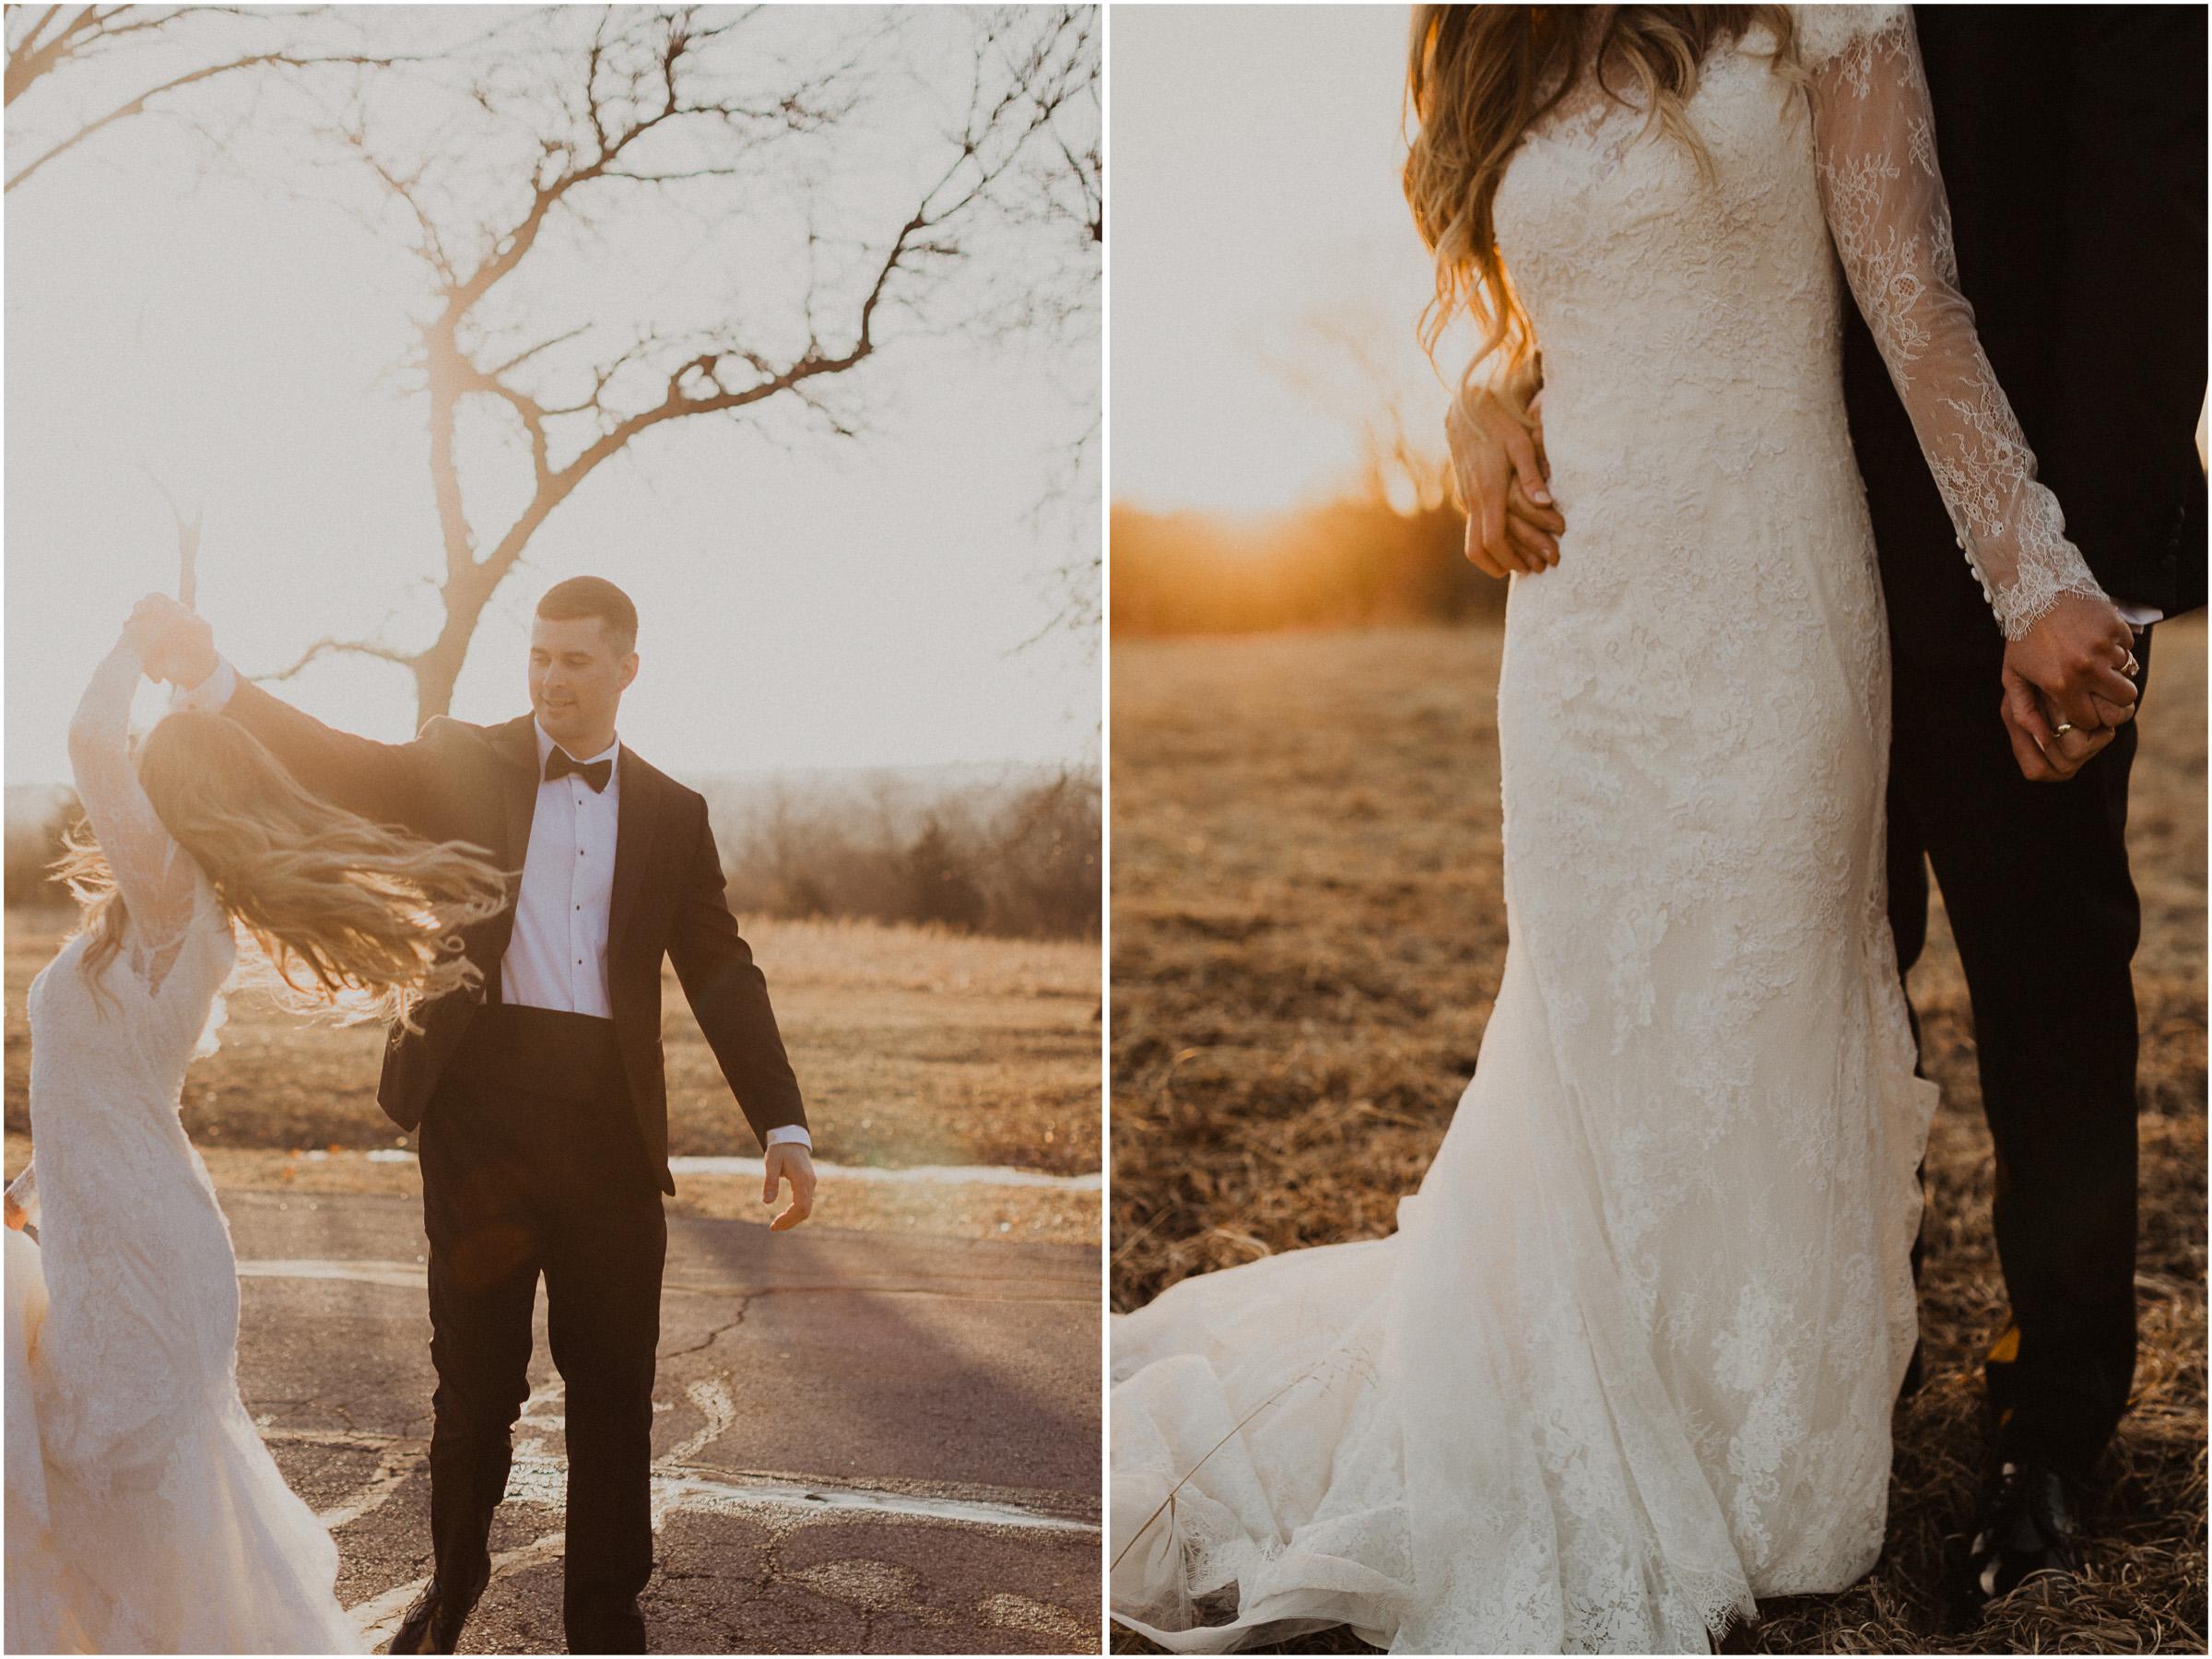 alyssa barletter photography shawnee mission park winter wedding 8th and main grandview missouri photographer-33.jpg